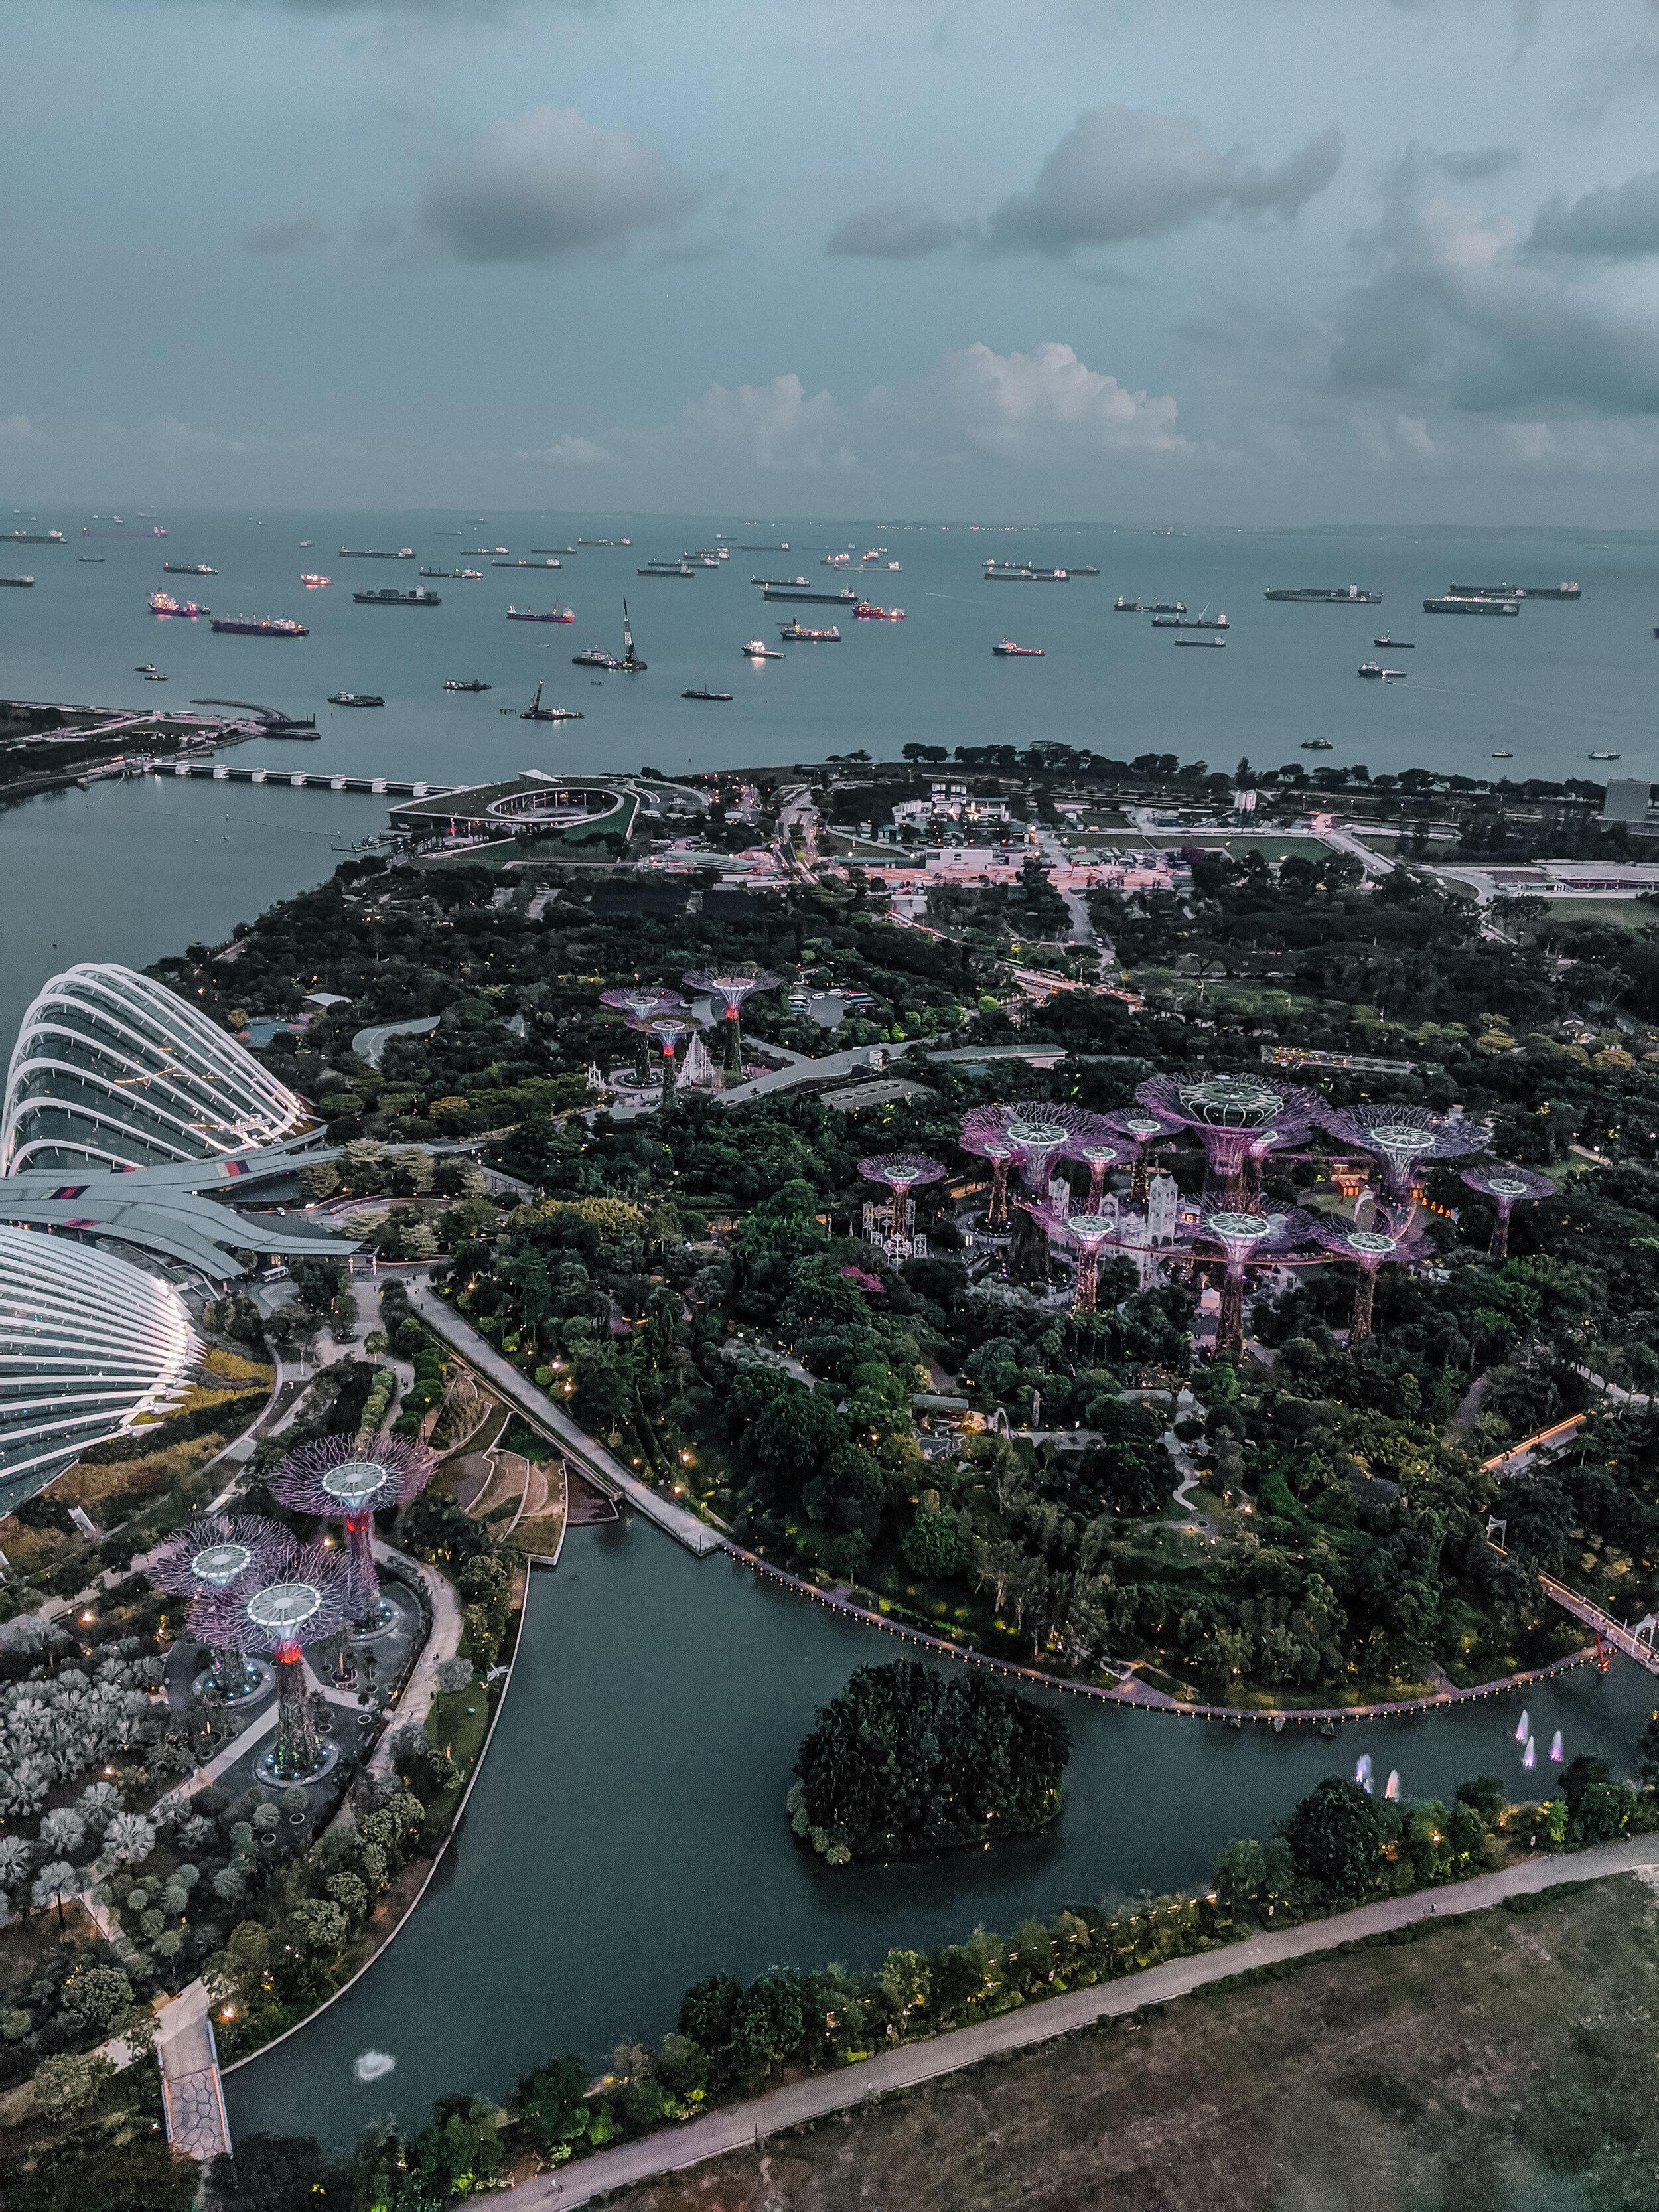 Rachel Off Duty: Marina Bay Sands Observation Deck in Singapore